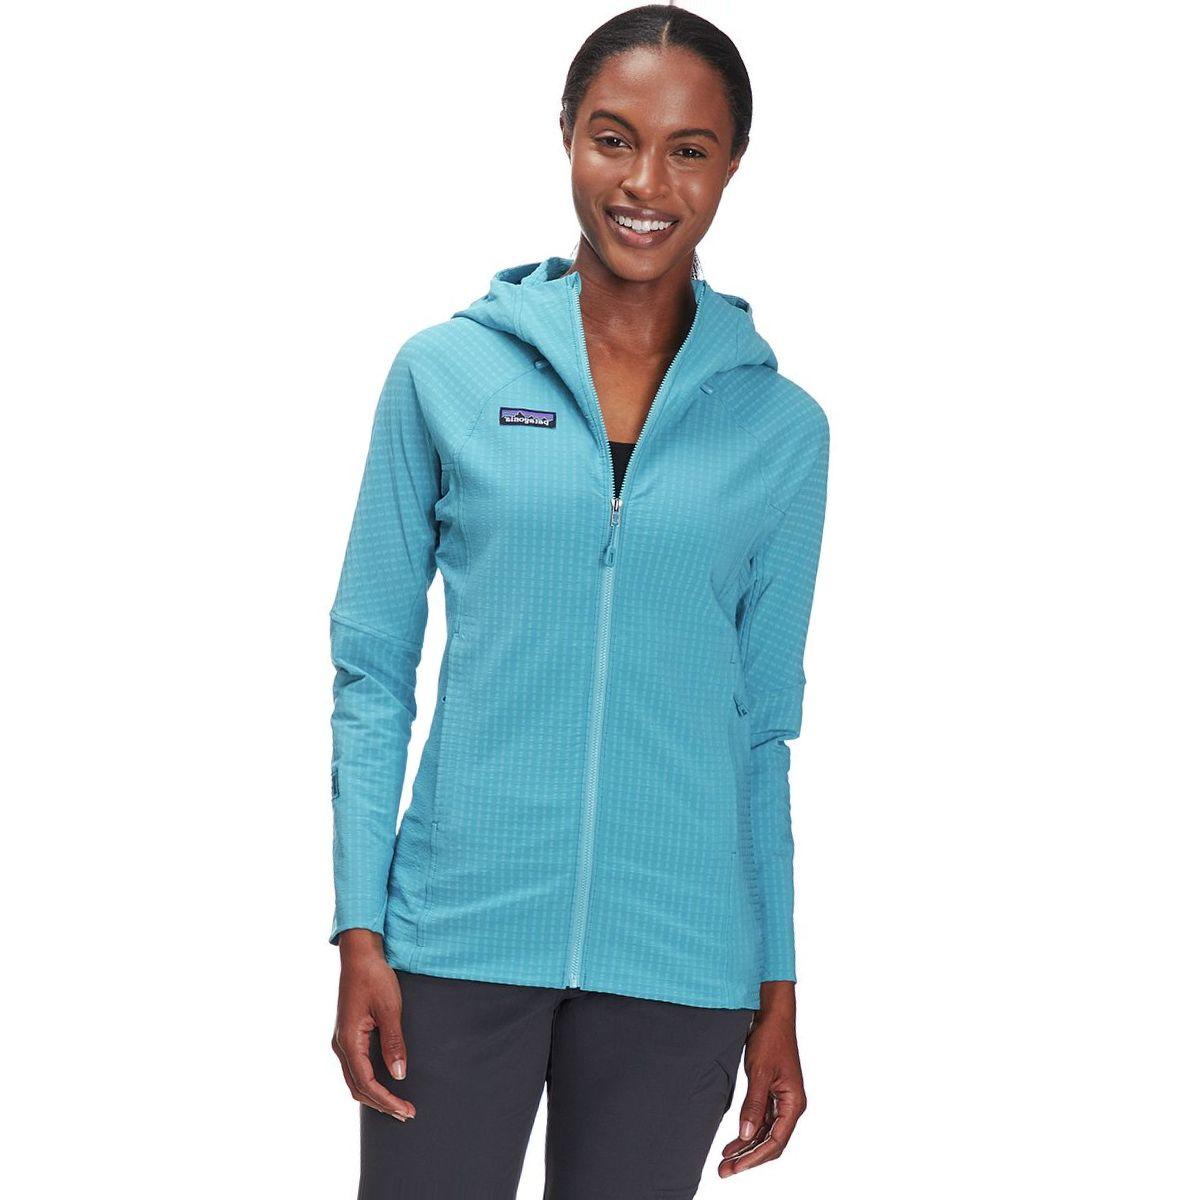 Patagonia R1 Techface Hooded Jacket - Women's